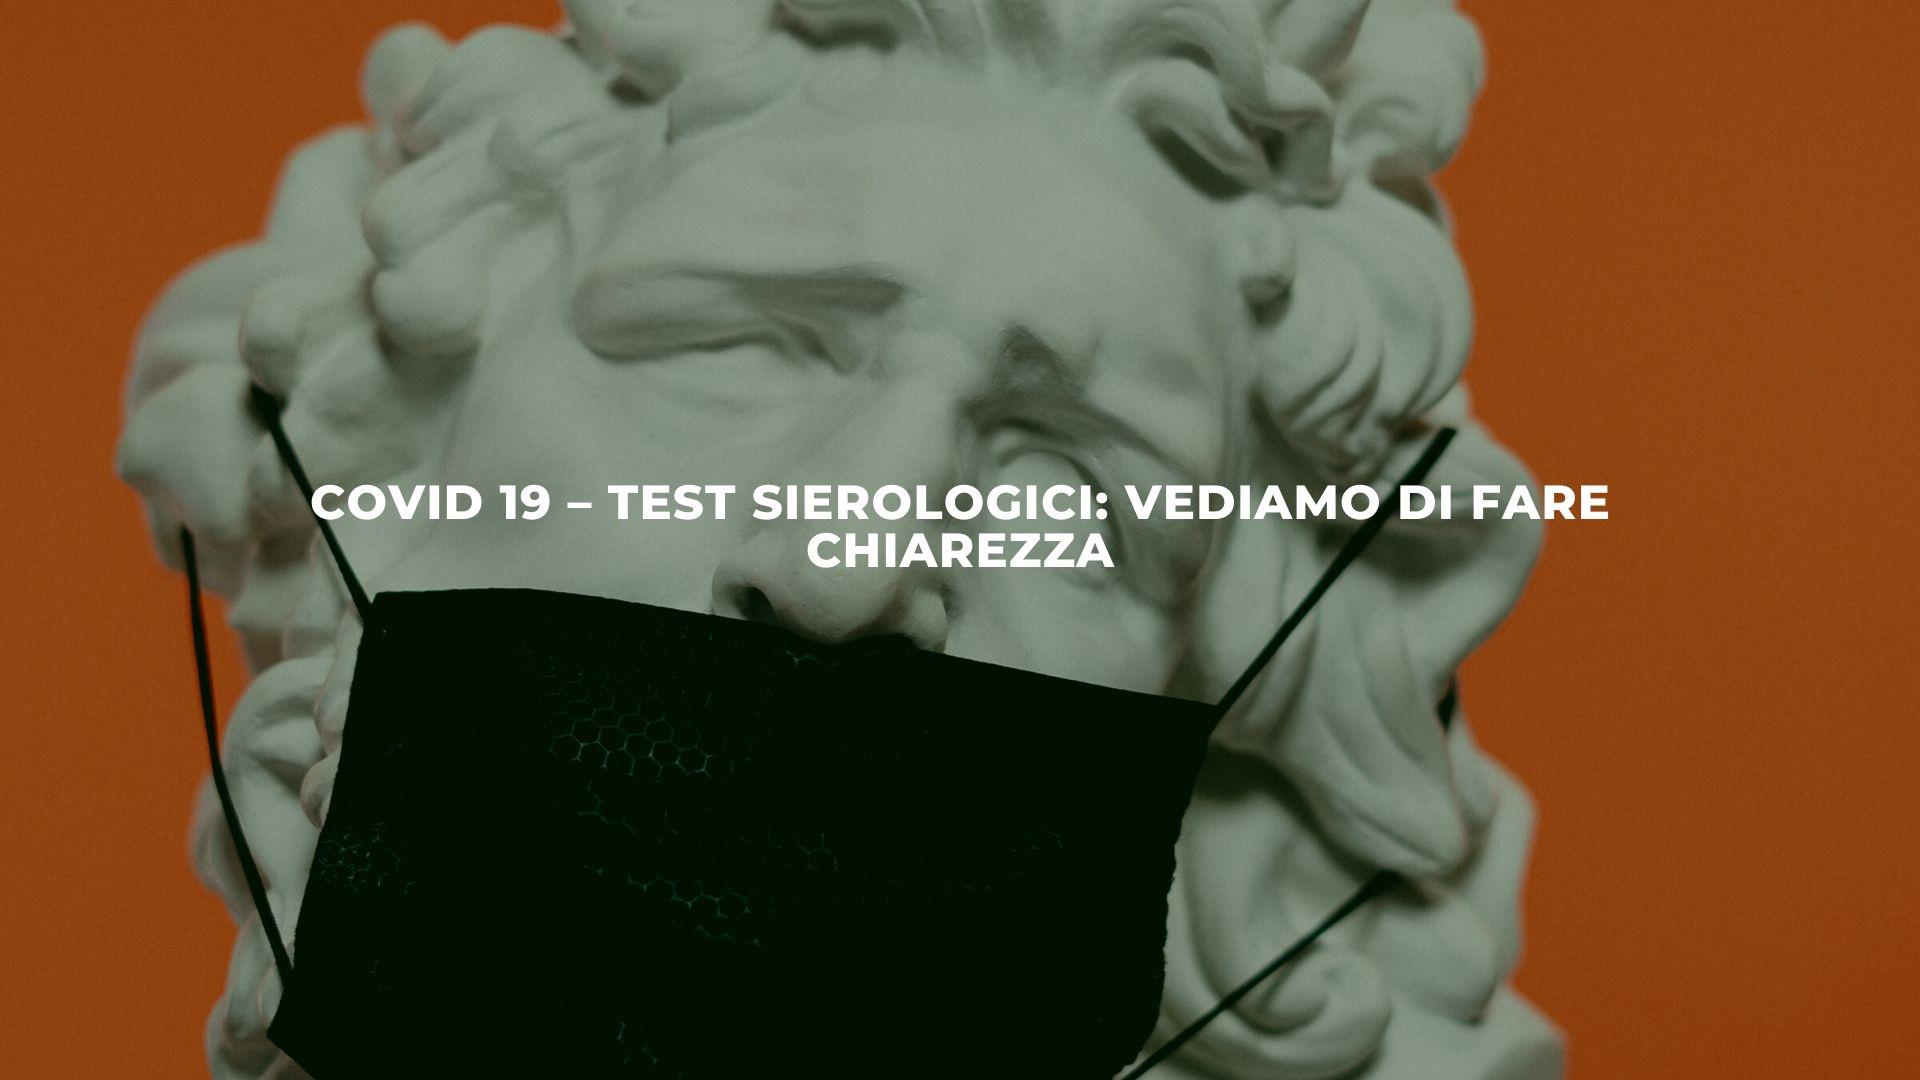 Analisi e test scientifici, test microbiota, test sierologici - Genes4you - Genes4you(2)